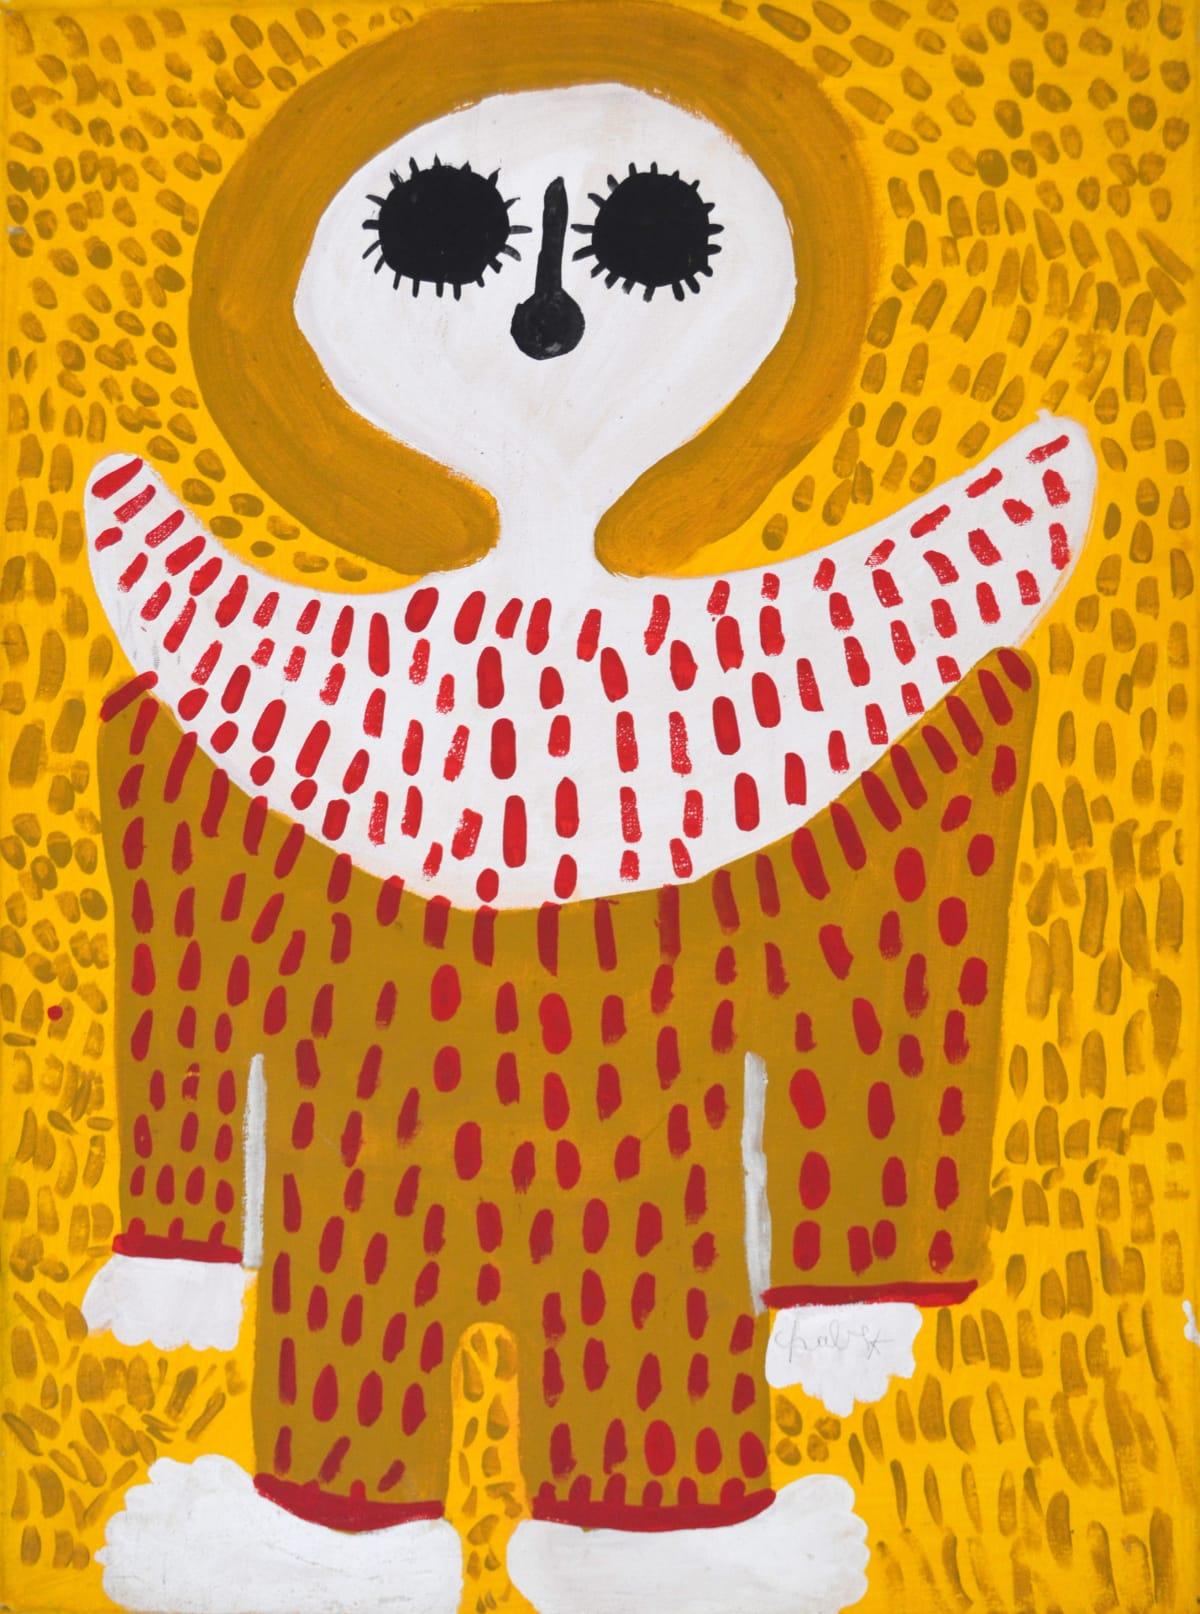 Mabel King Wandjina acrylic on canvas 71 x 52 cm